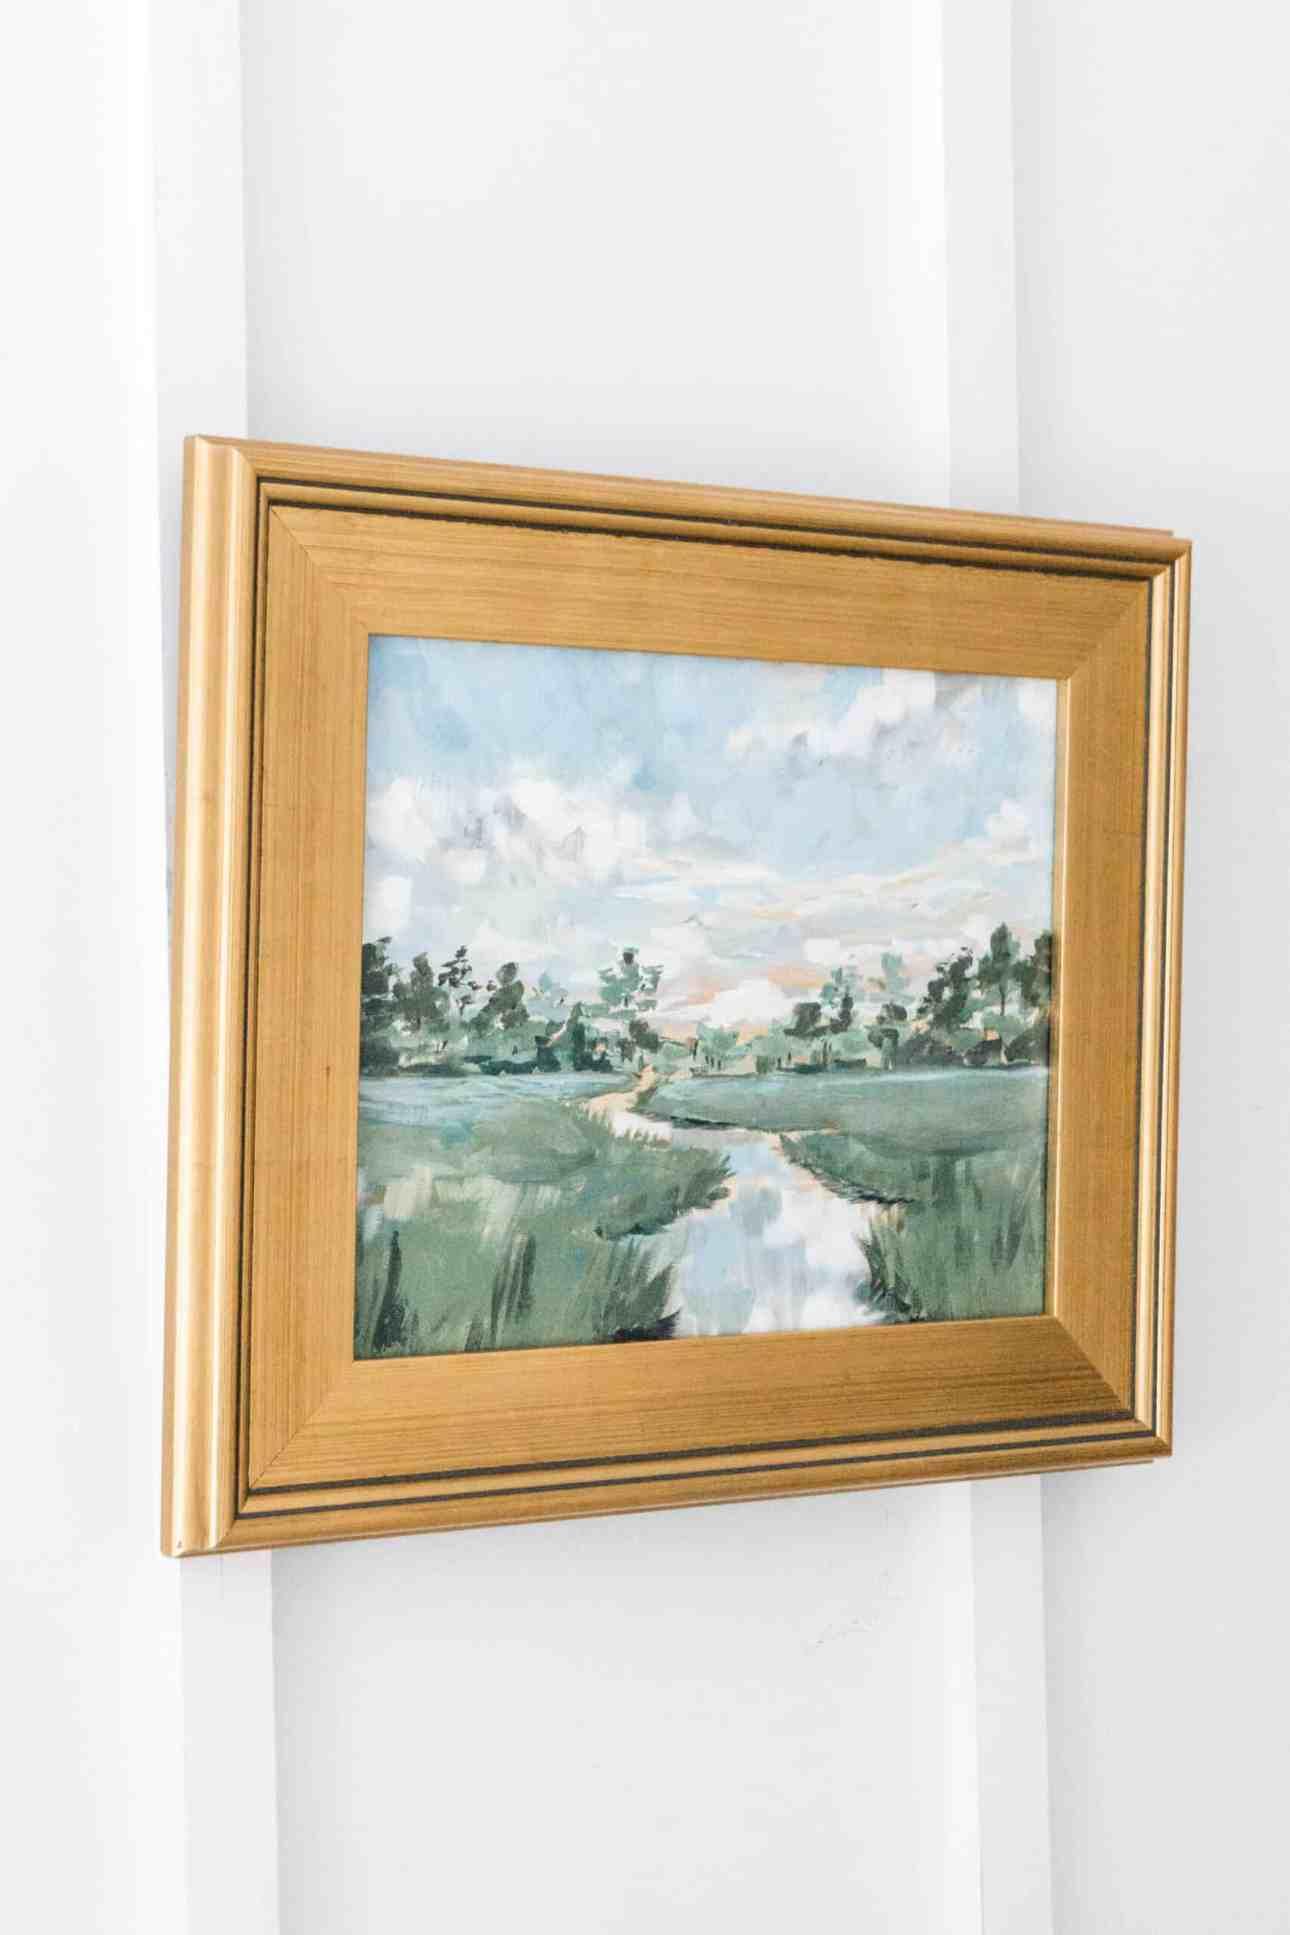 Art frames from amazon.